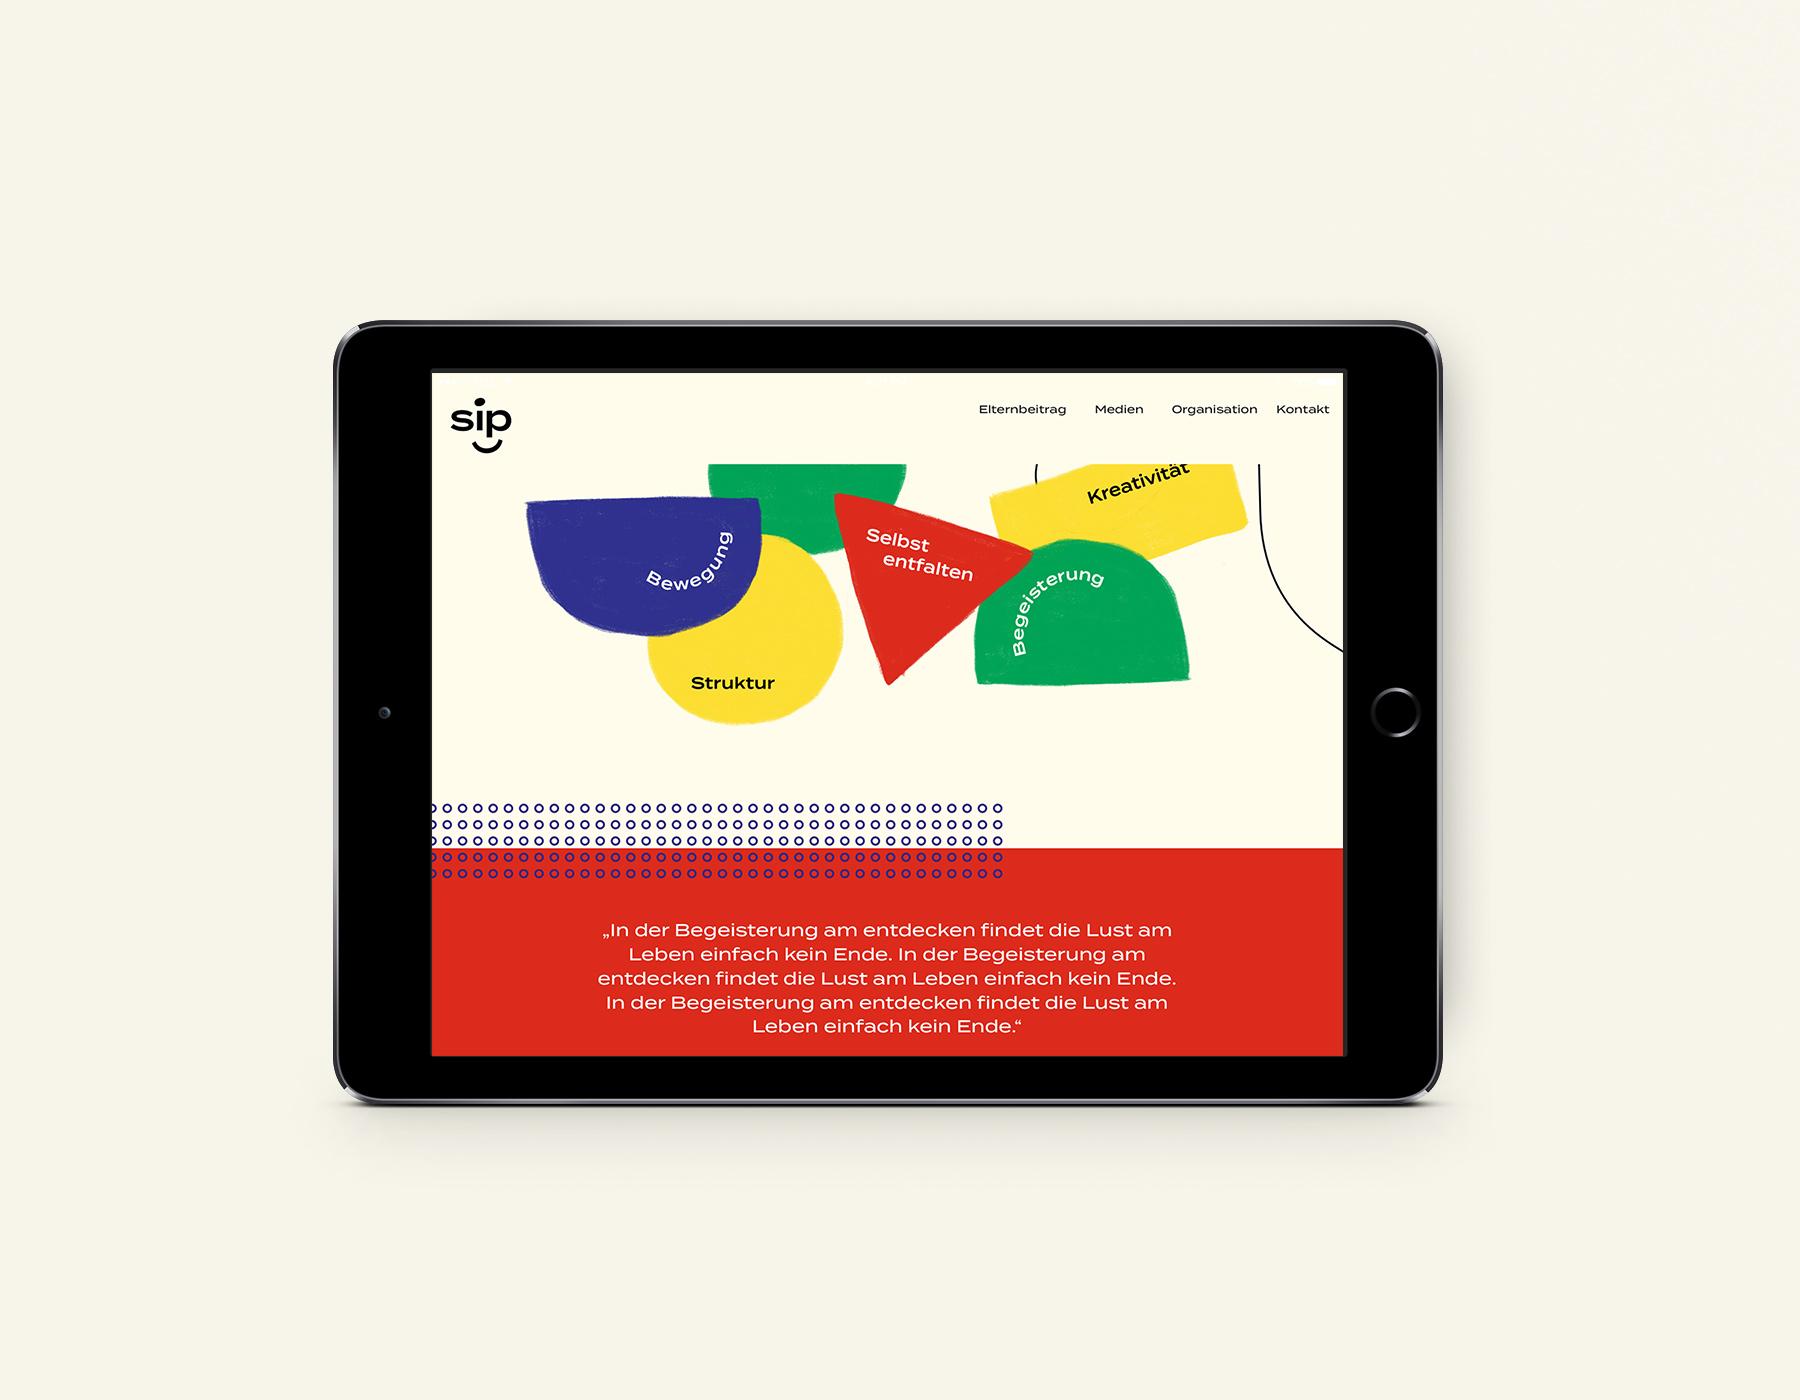 SIP-iPad-Landscape